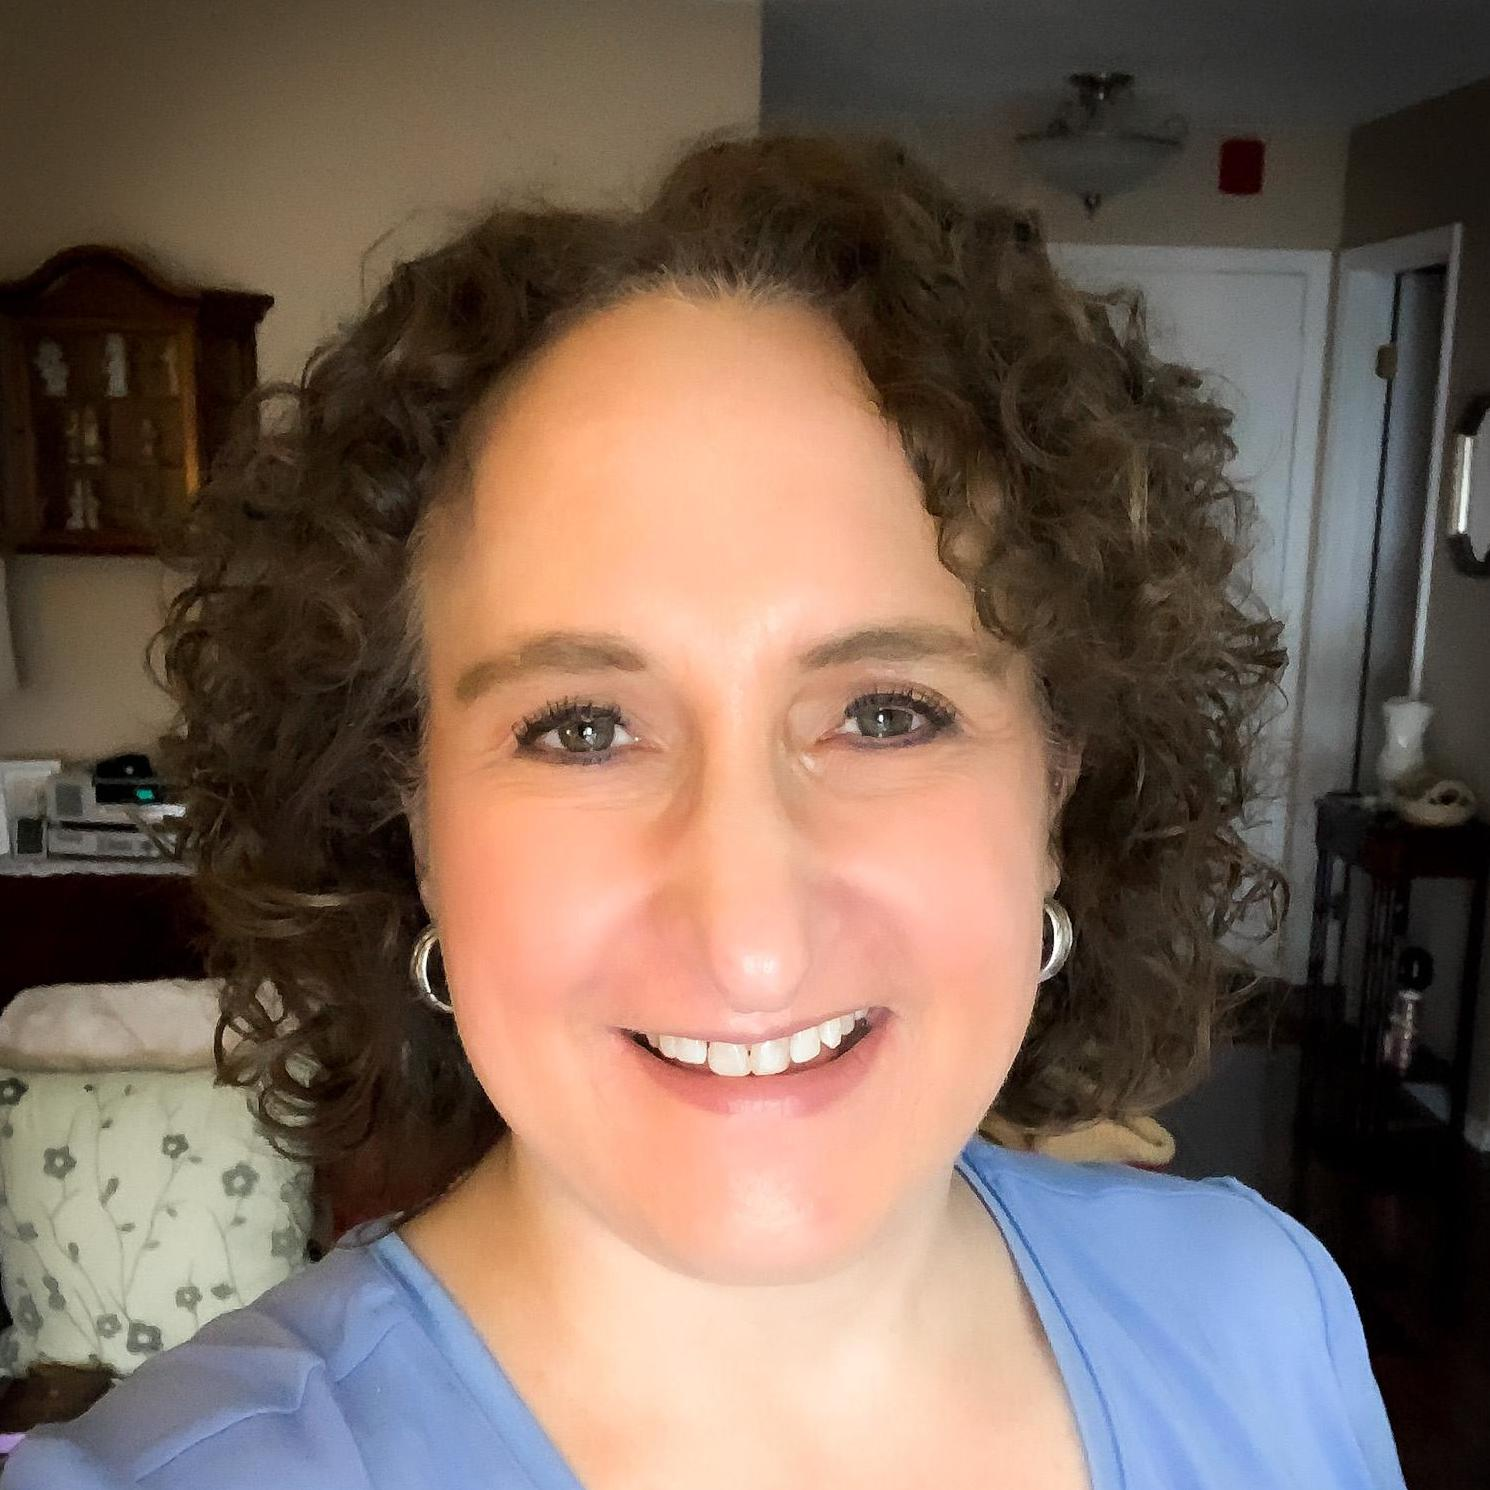 Sharon Van Dyke's Profile Photo